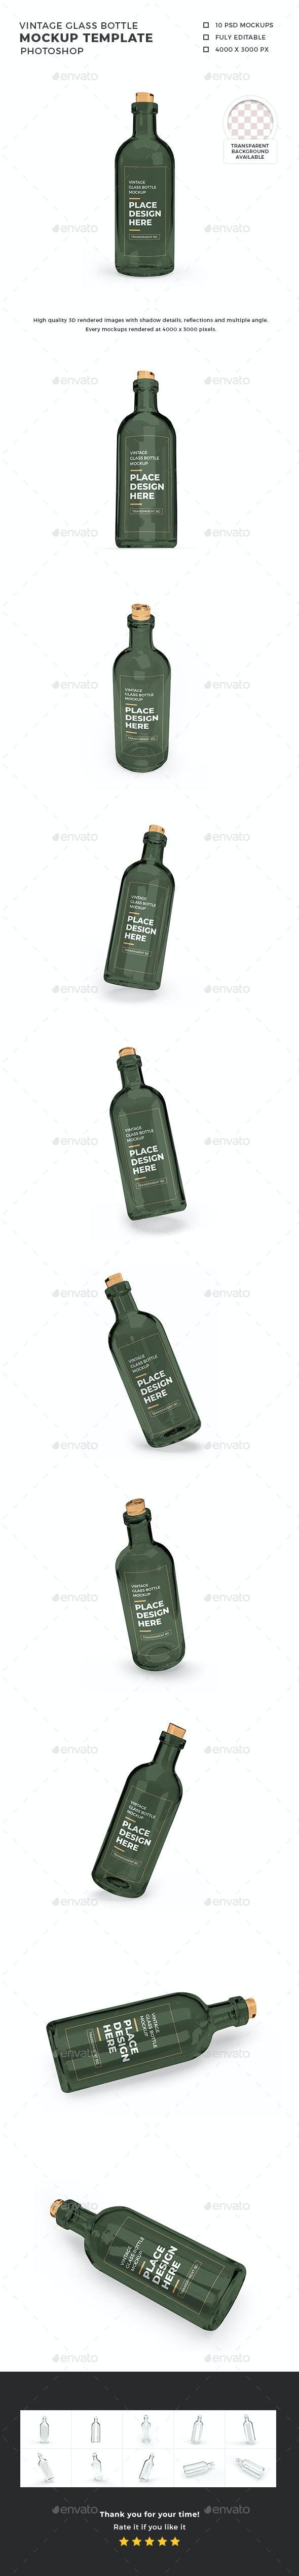 Vintage Glass Bottle 3D Mockup Template - Food and Drink Packaging